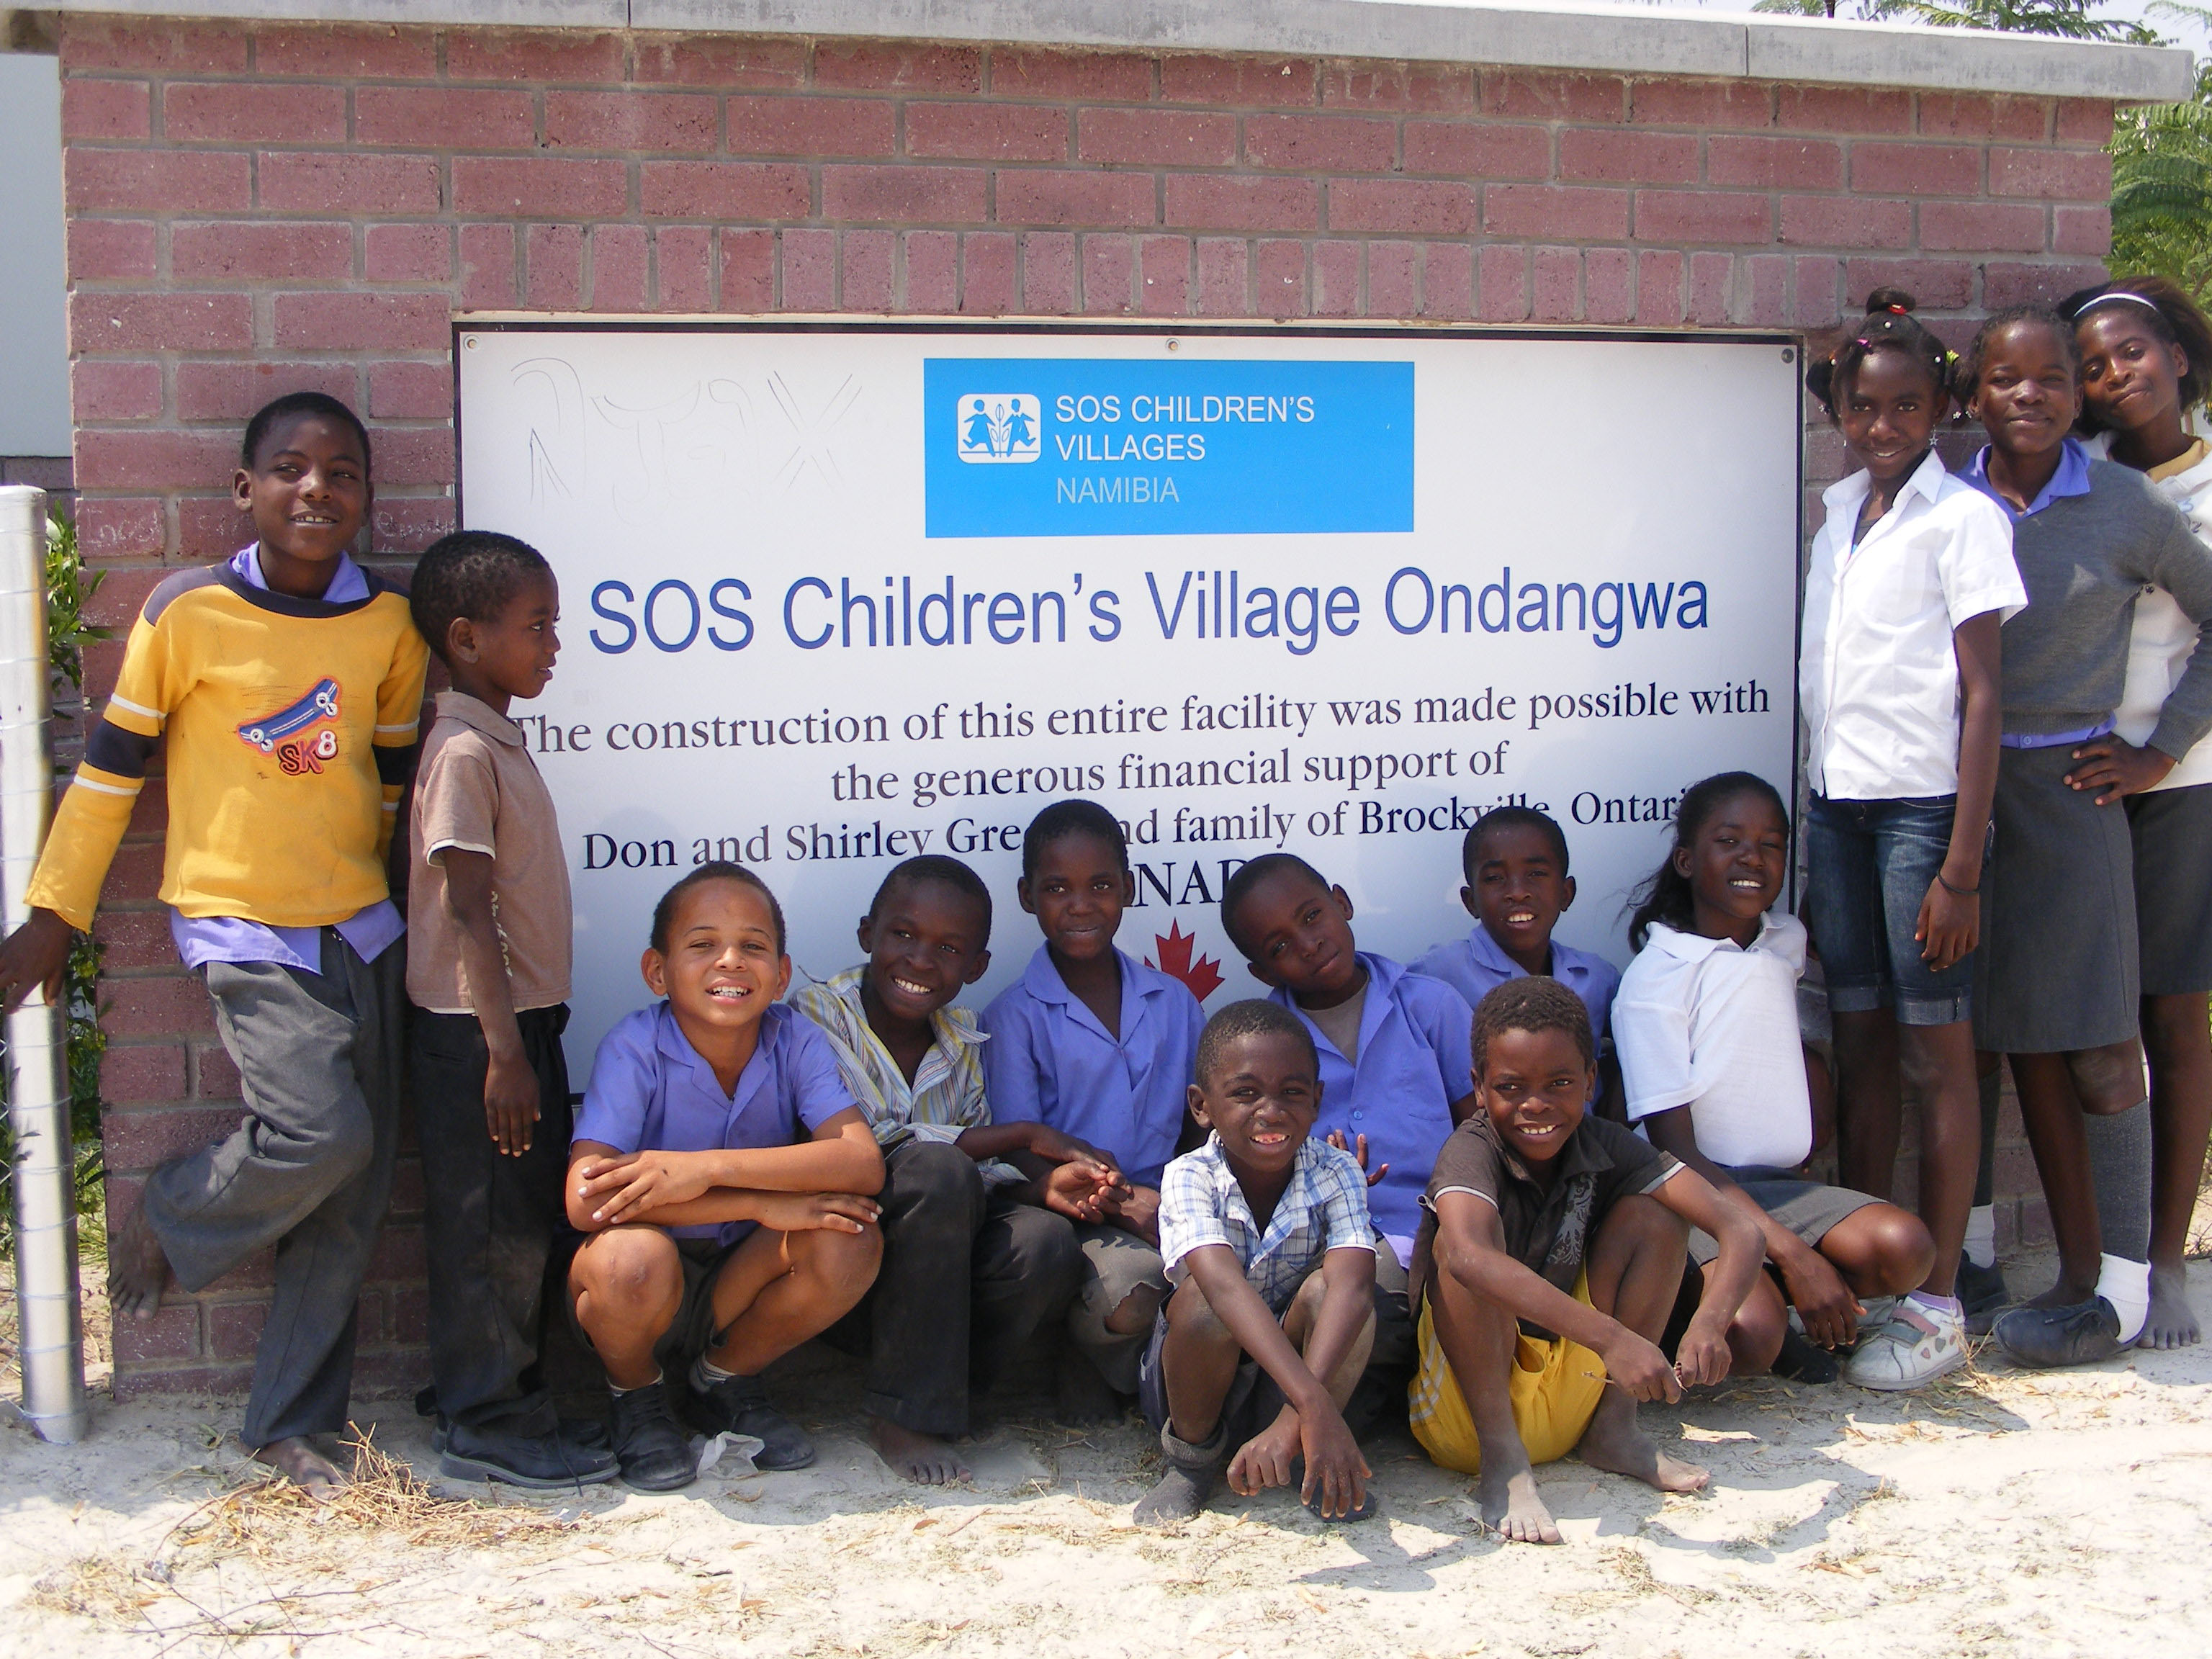 SOS Children's Villages: A Brief History